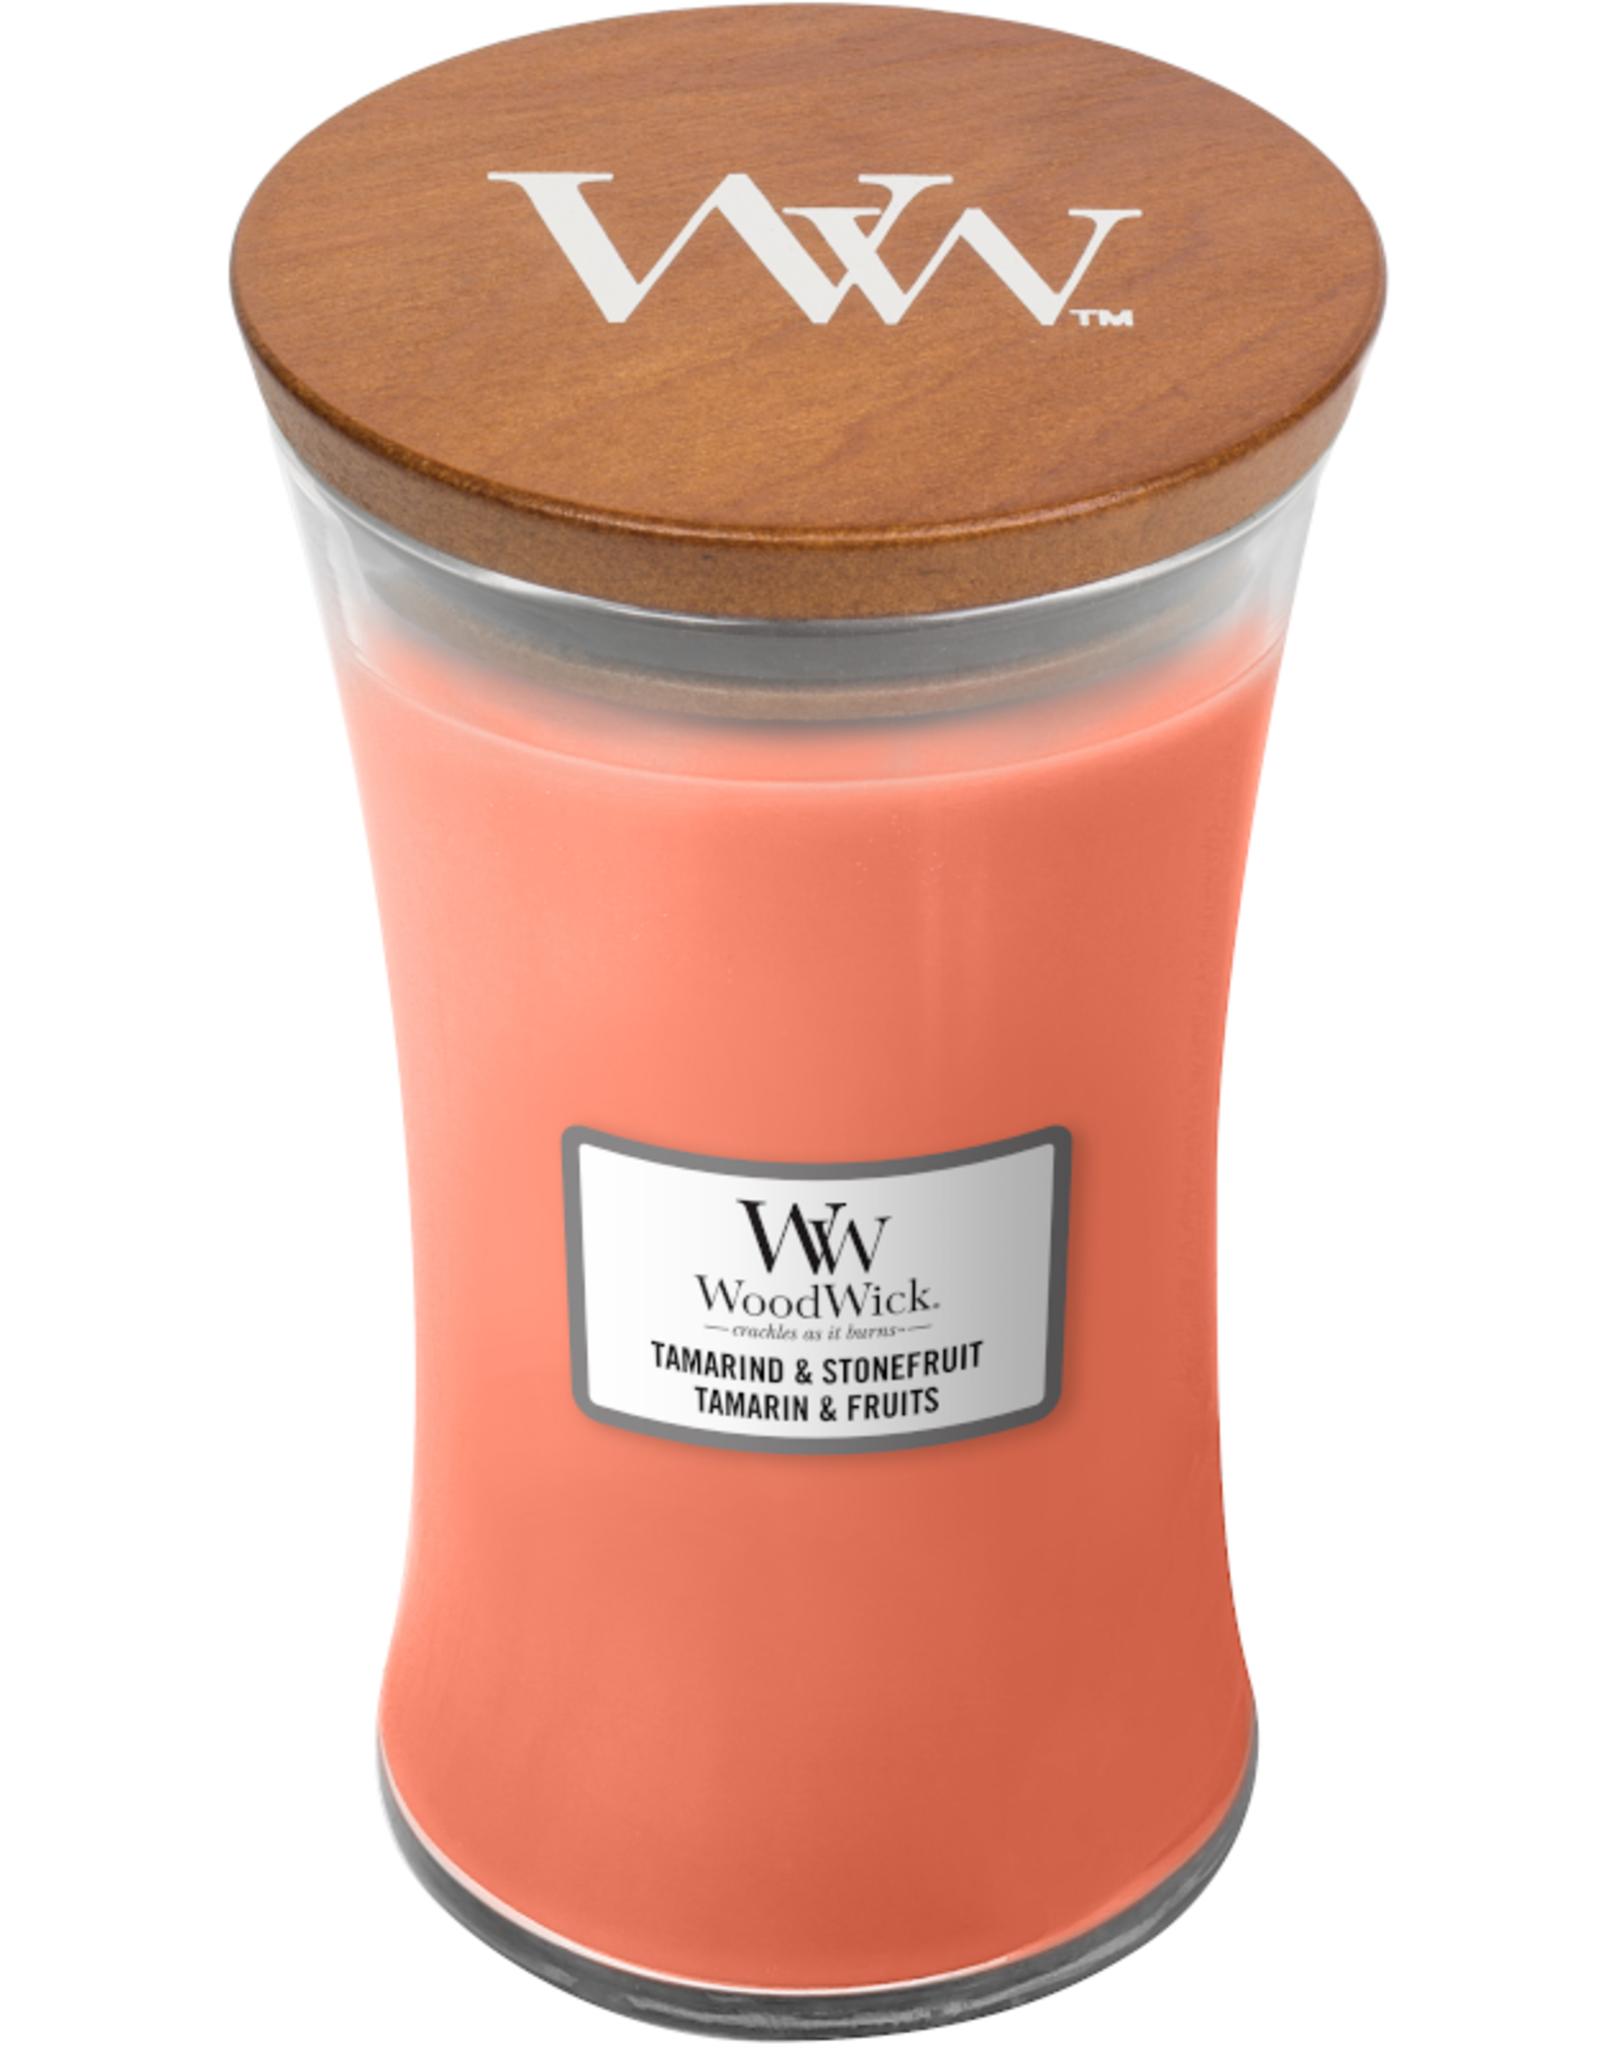 "WoodWick Kaars WoodWick ""Tamarind & Stonefruit"" Large - WoodWick"